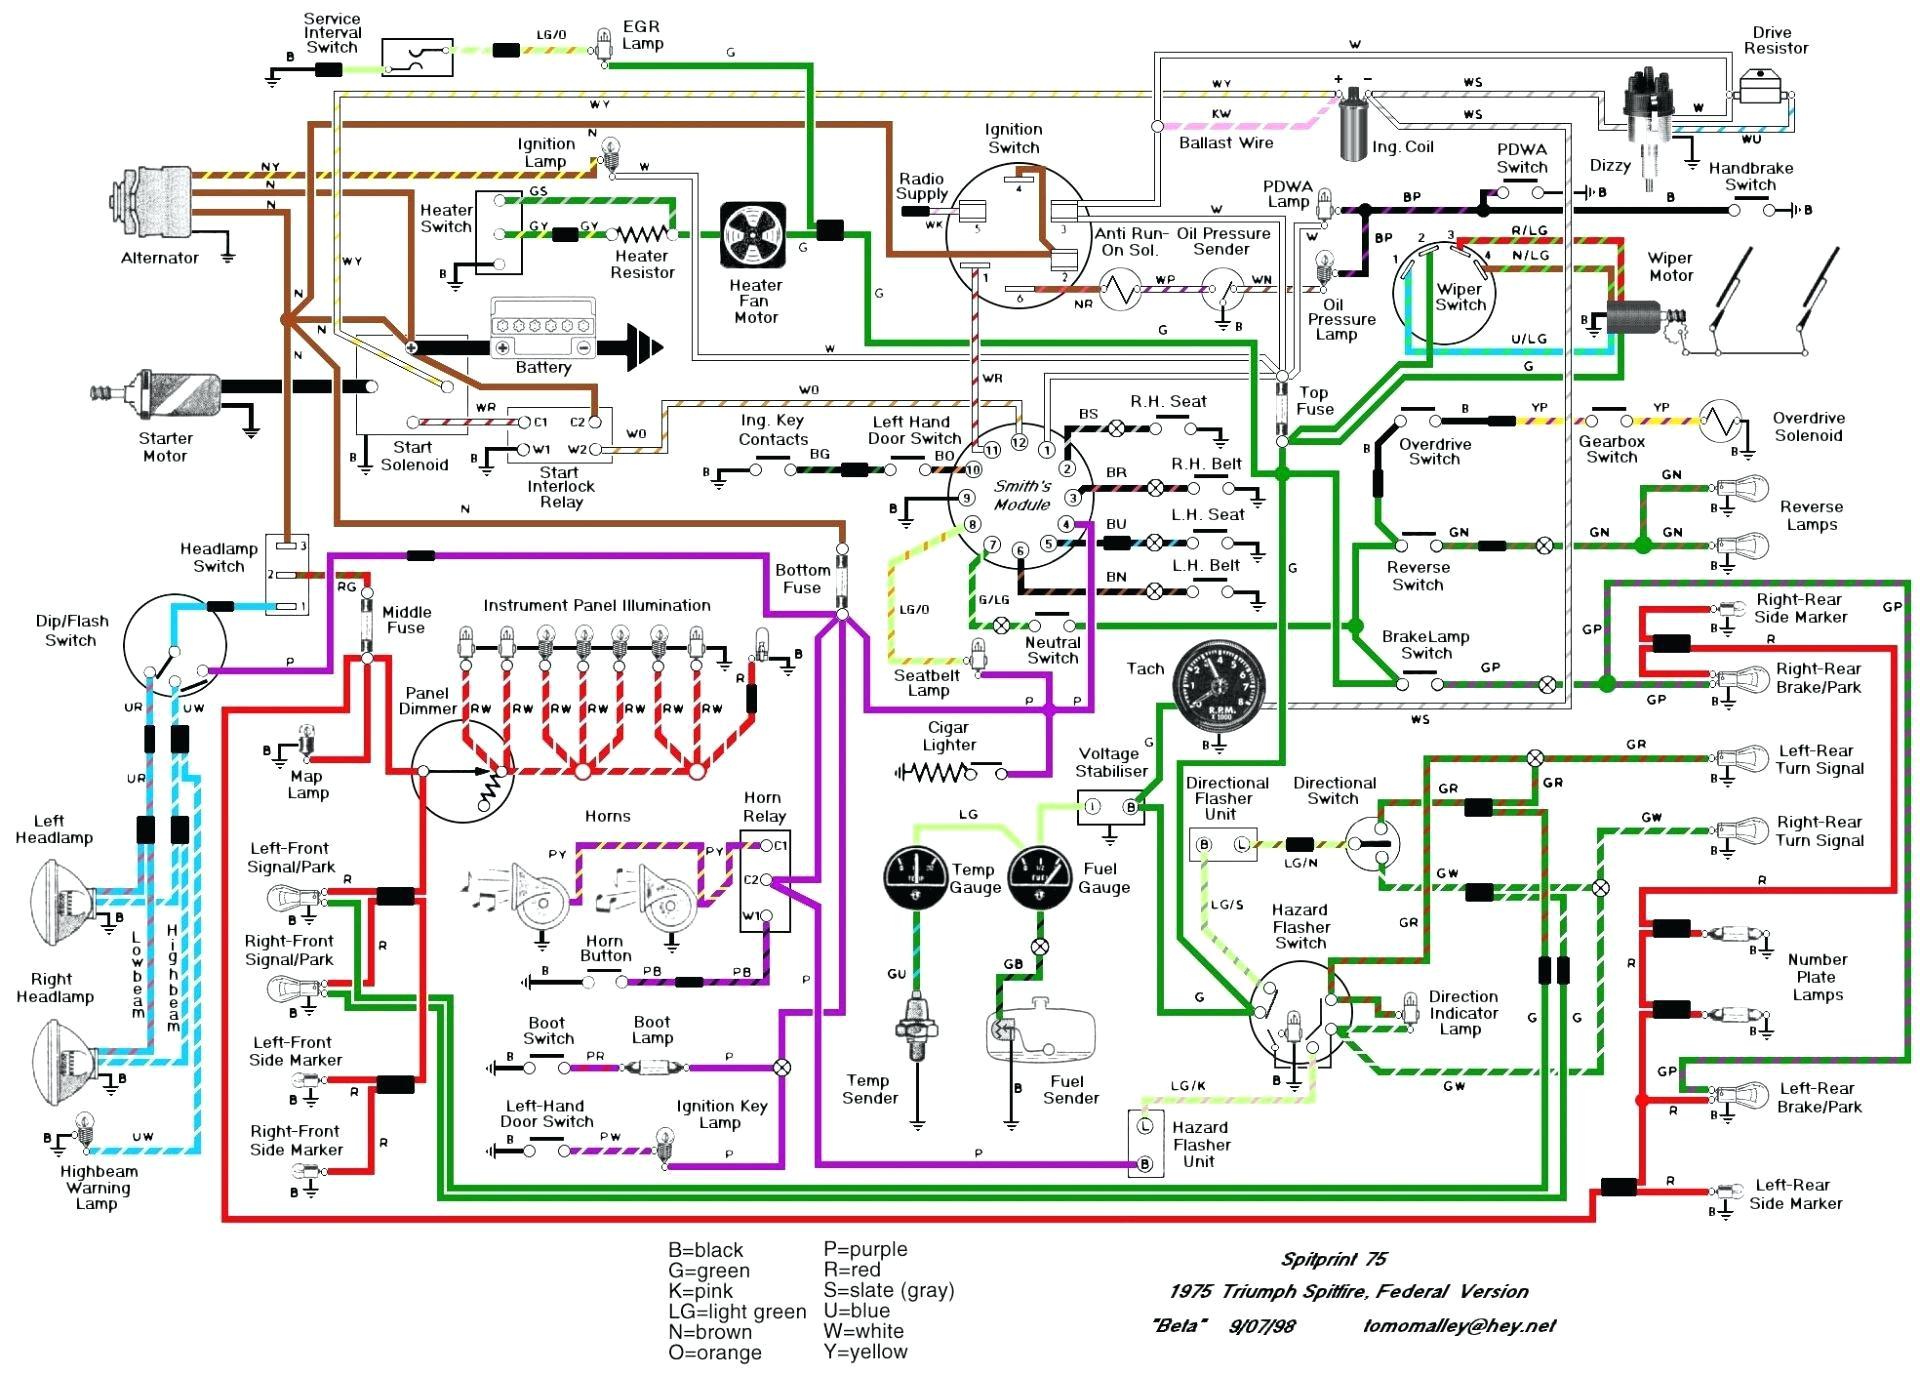 72 mgb wiring diagram free download schematic wiring diagrams schema 1977 mgb turn signal wiring diagram